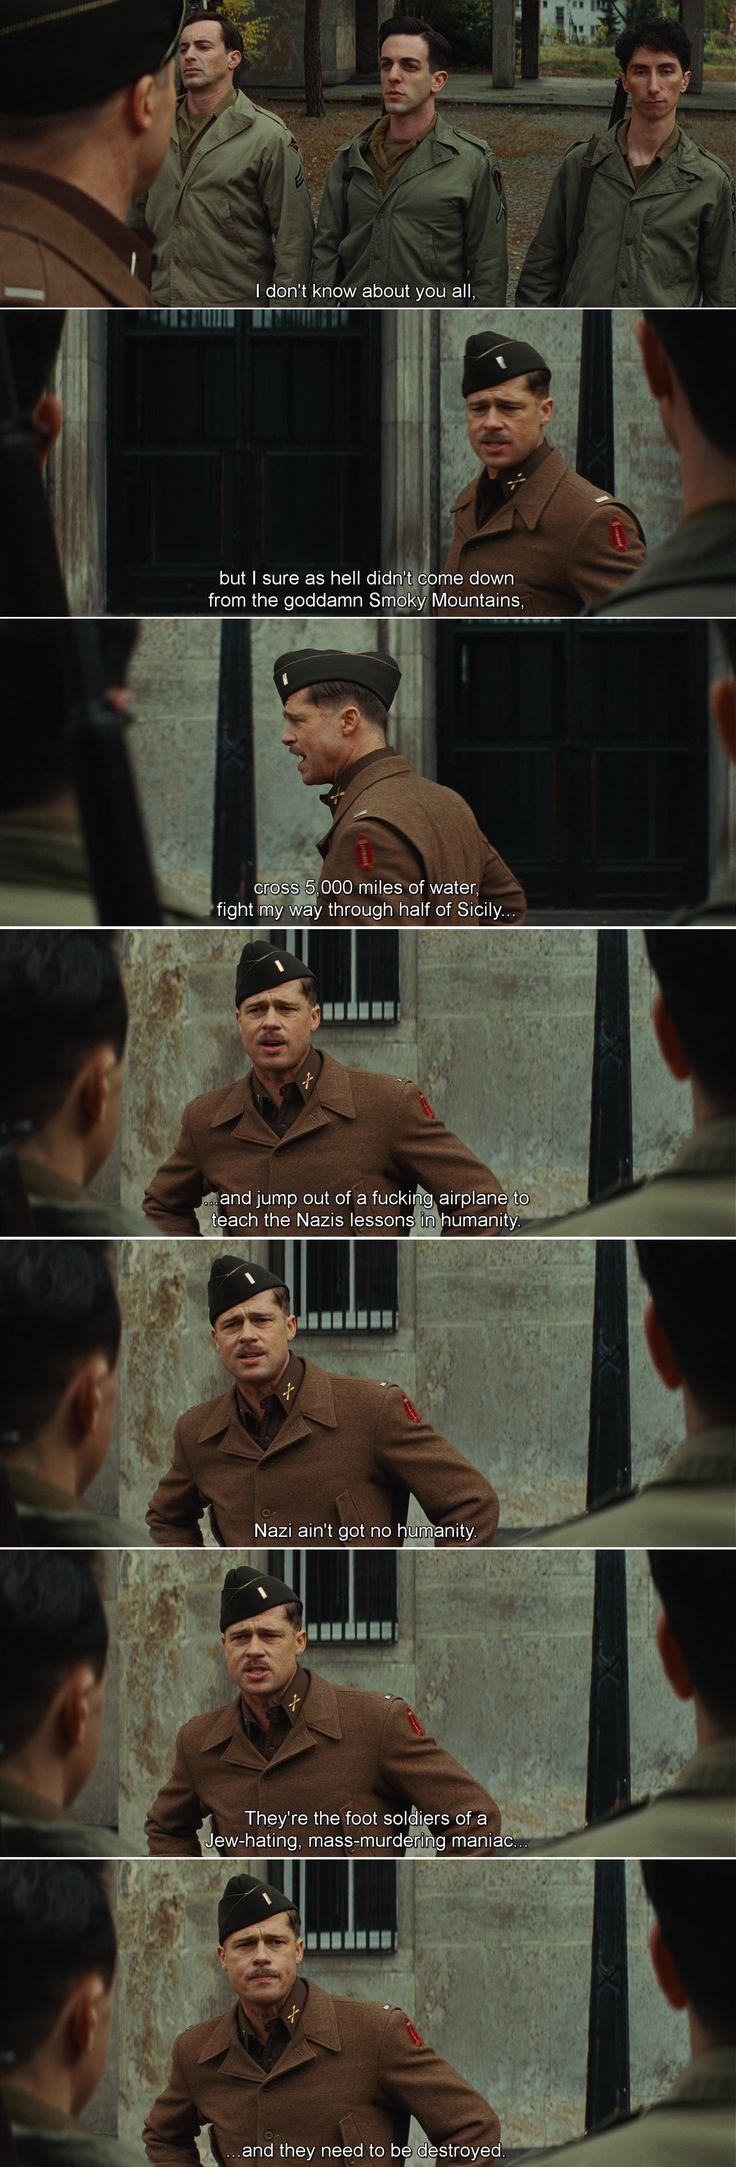 Inglourious Basterds (Quentin Tarantino, 2009)